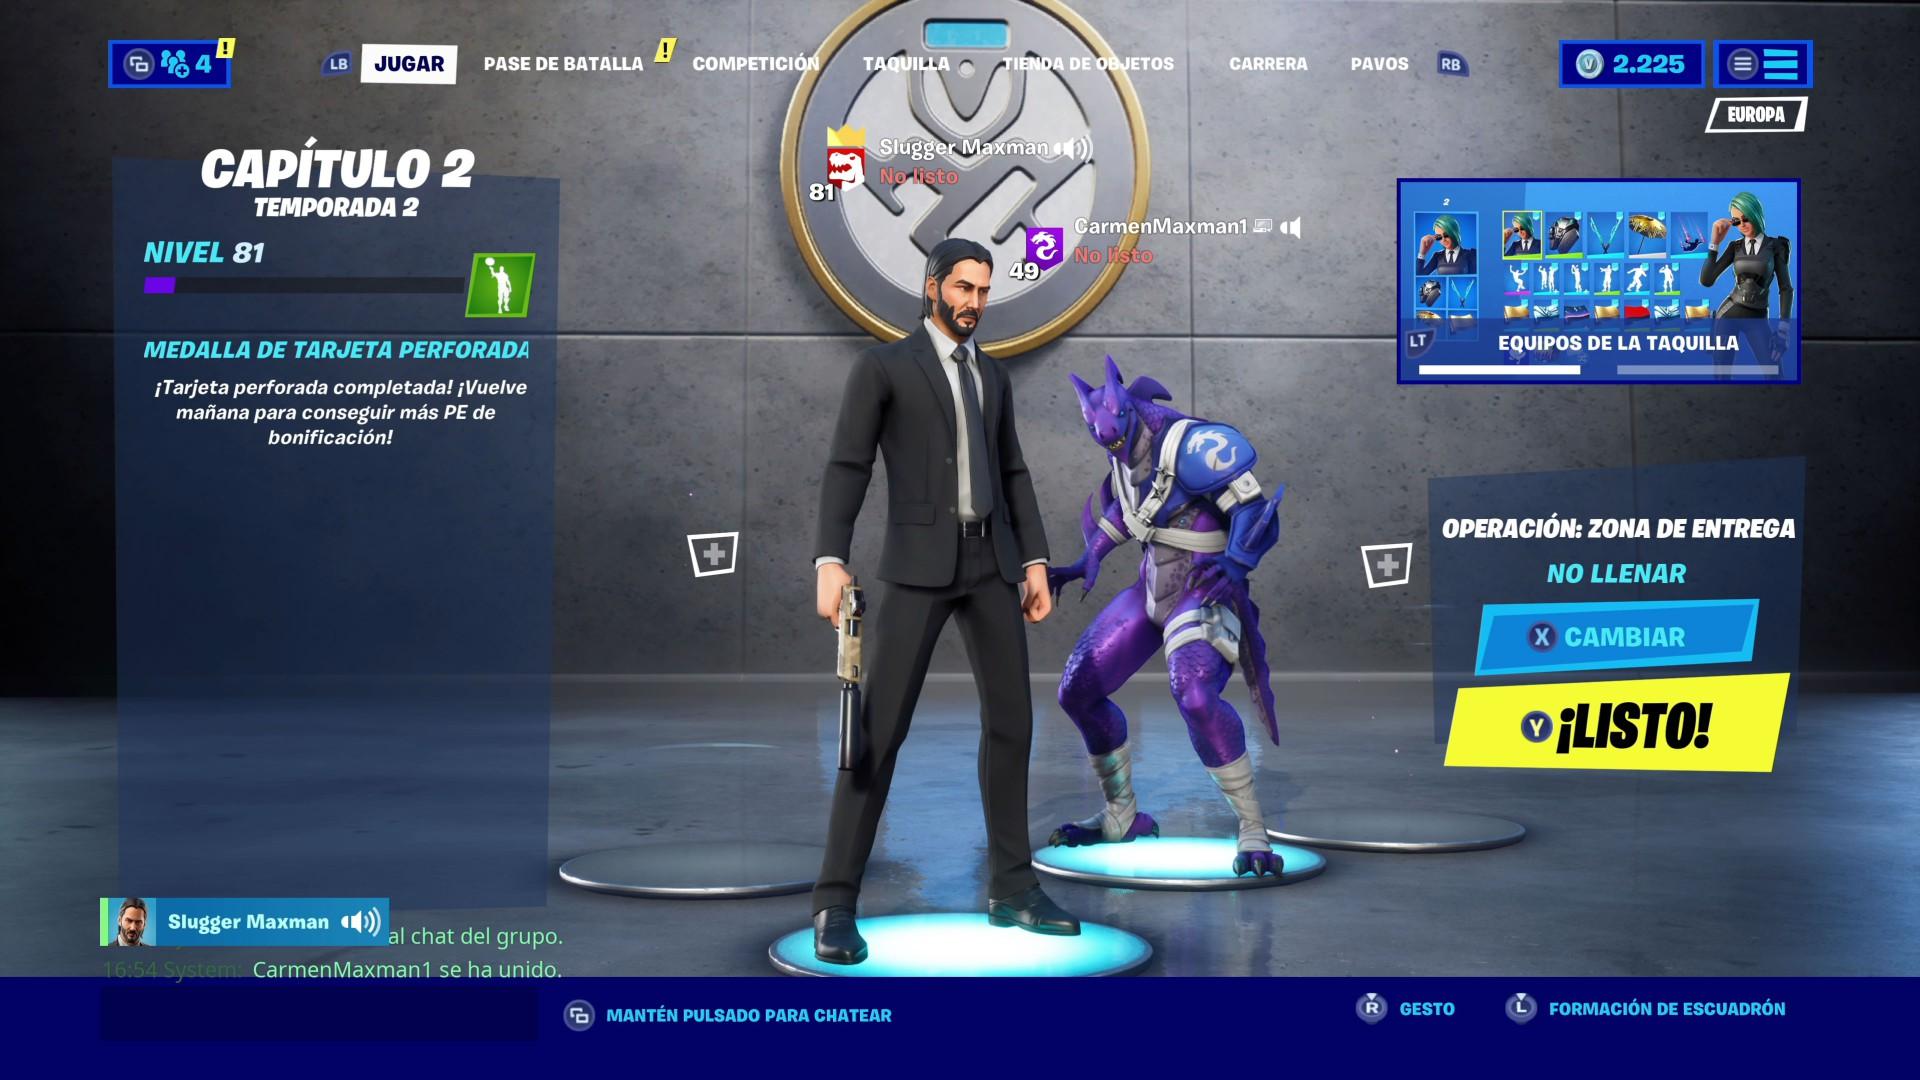 Playstation Servers Fortnite Fortnite Como Activar El Crossplay En Ps4 Ps5 Switch Pc Xbox One Y Xbox Series X S 2021 Meristation